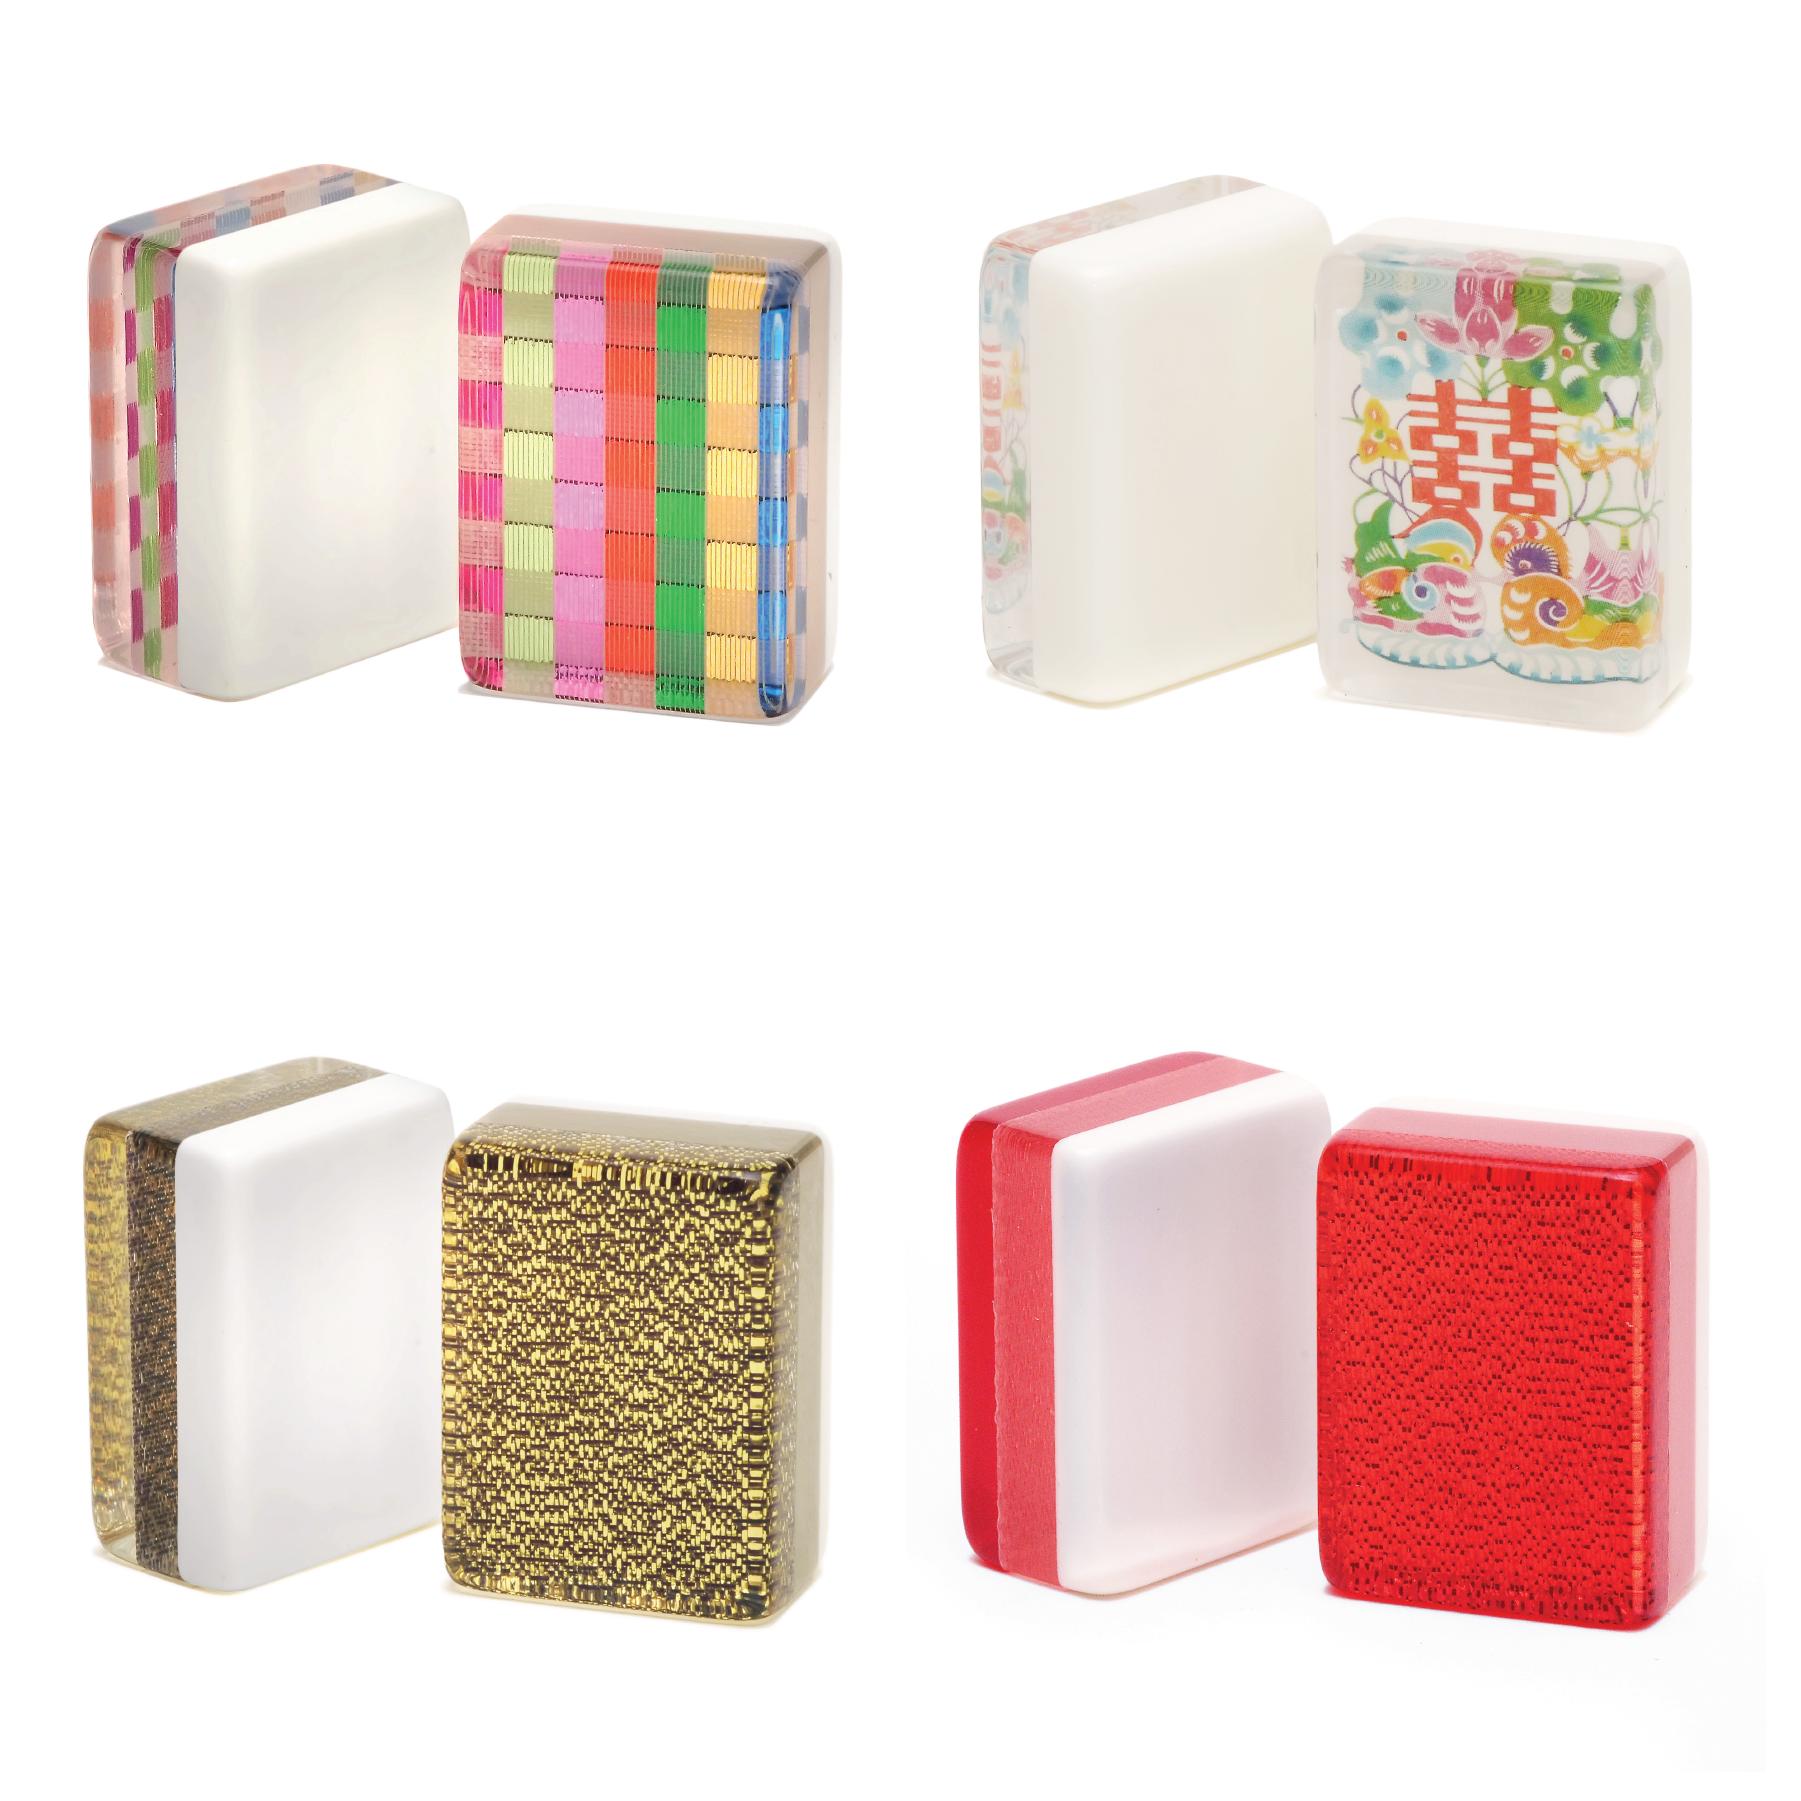 Clearance Premium American Mah Jongg Tiles On Sale